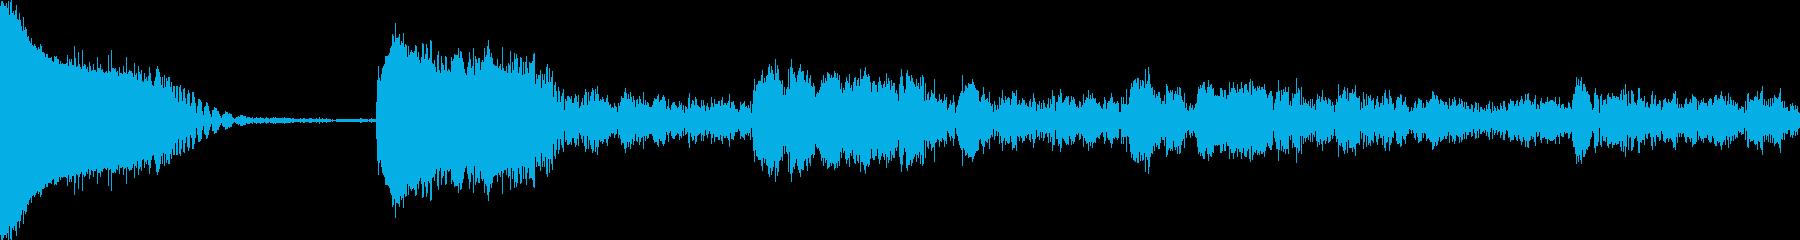 AMGアナログFX19の再生済みの波形